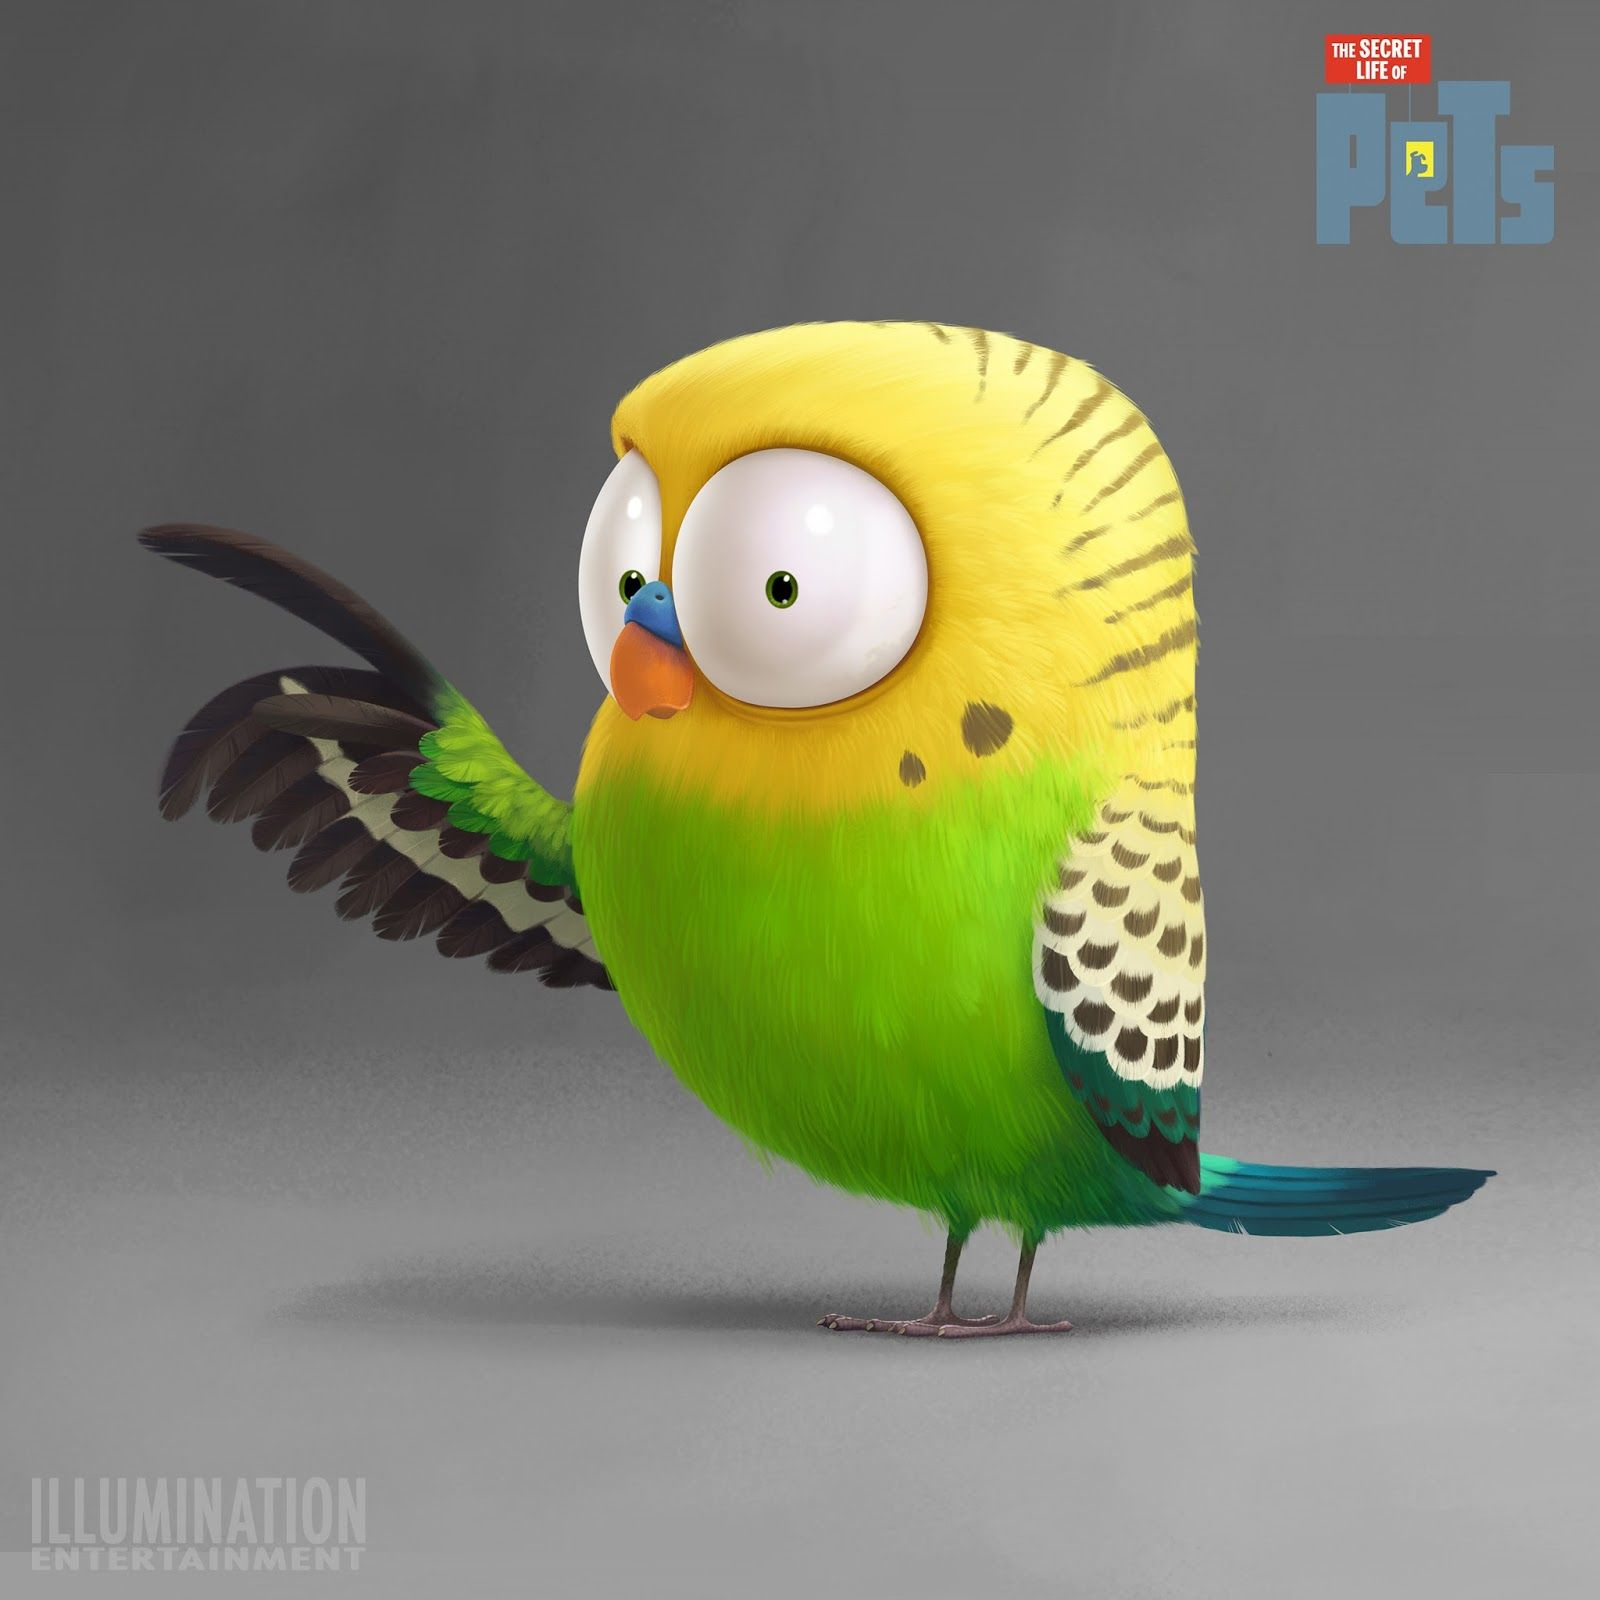 Artes Do Filme The Secret Life Of Pets Por Ludo Gavillet Thecab The Concept Art Blog Character Design Character Illustration Animal Illustration